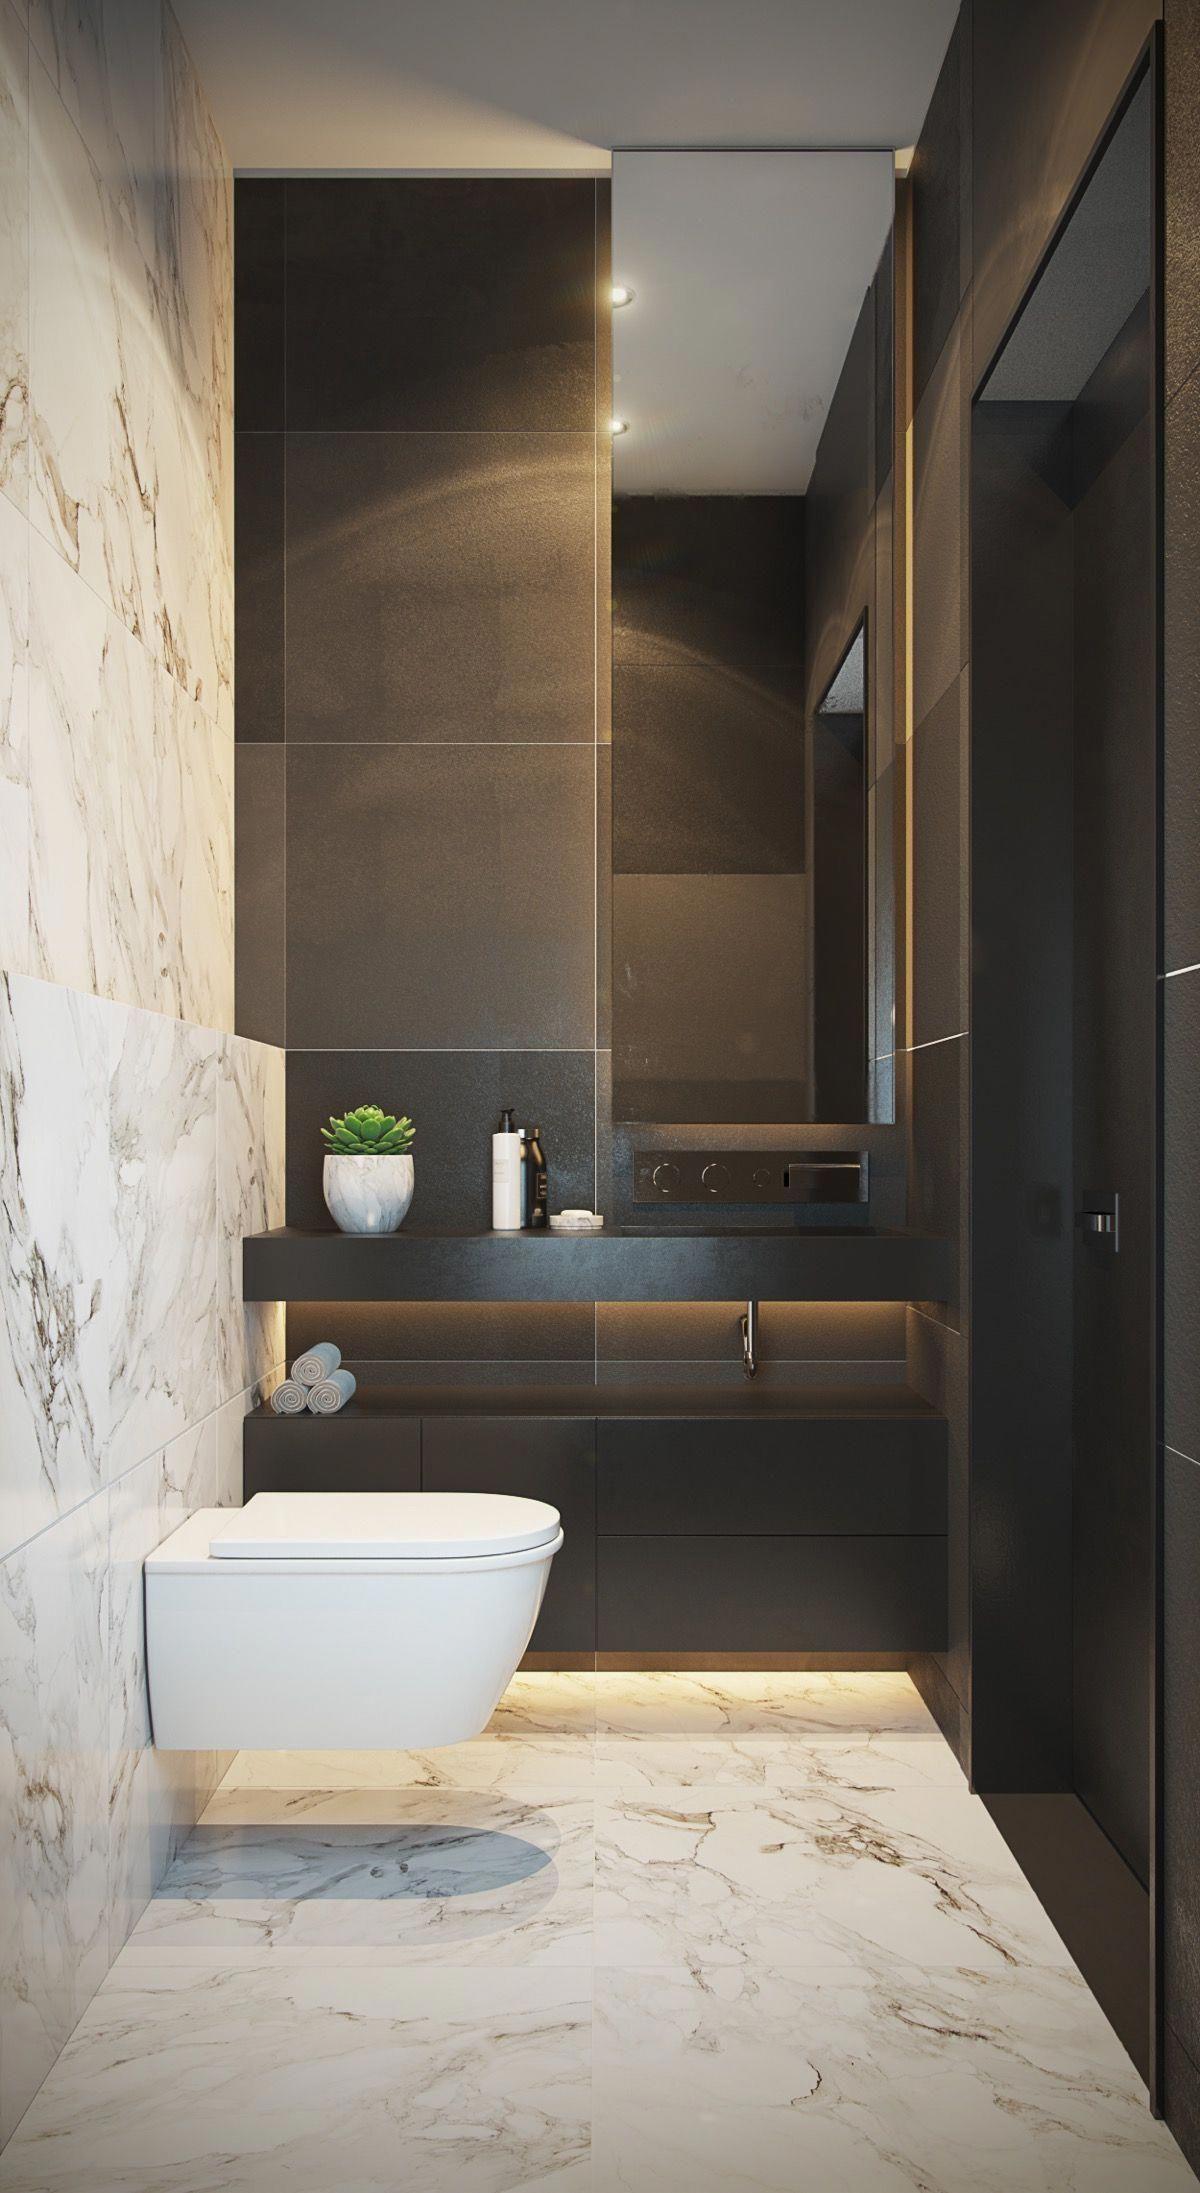 astounding calming modern minimalist bathroom white | The minimalist aesthetic is very pleasing and calming on ...